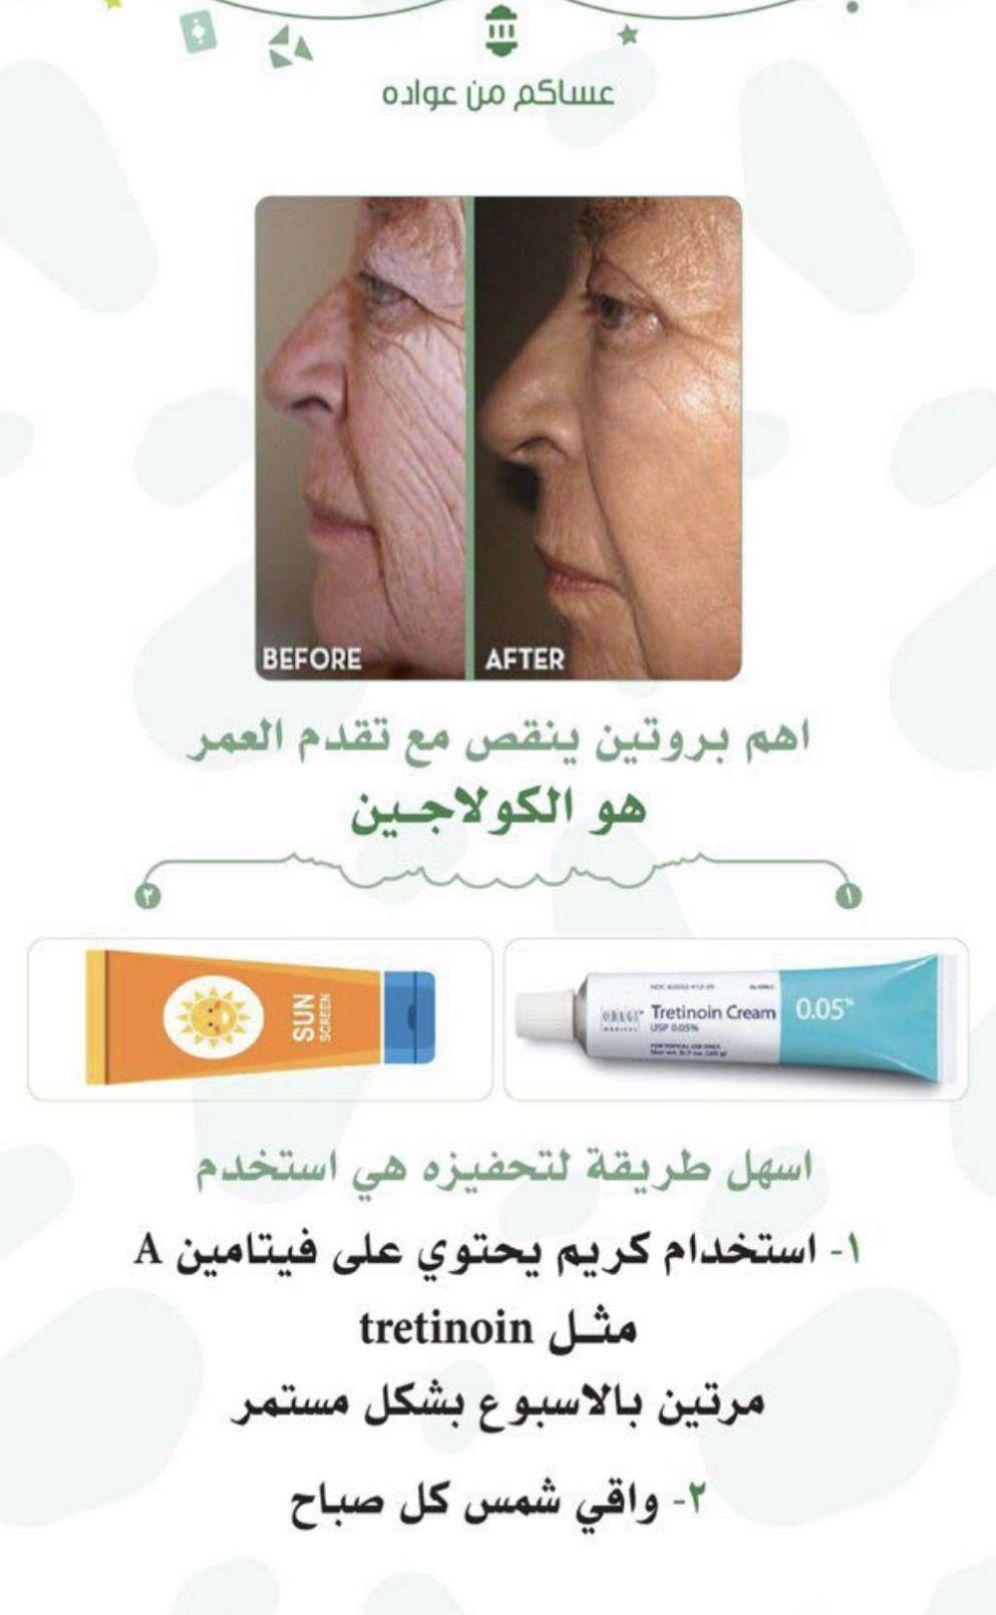 Pin By Amira Hamad On Doctor Tretinoin Cream Tretinoin Incoming Call Screenshot